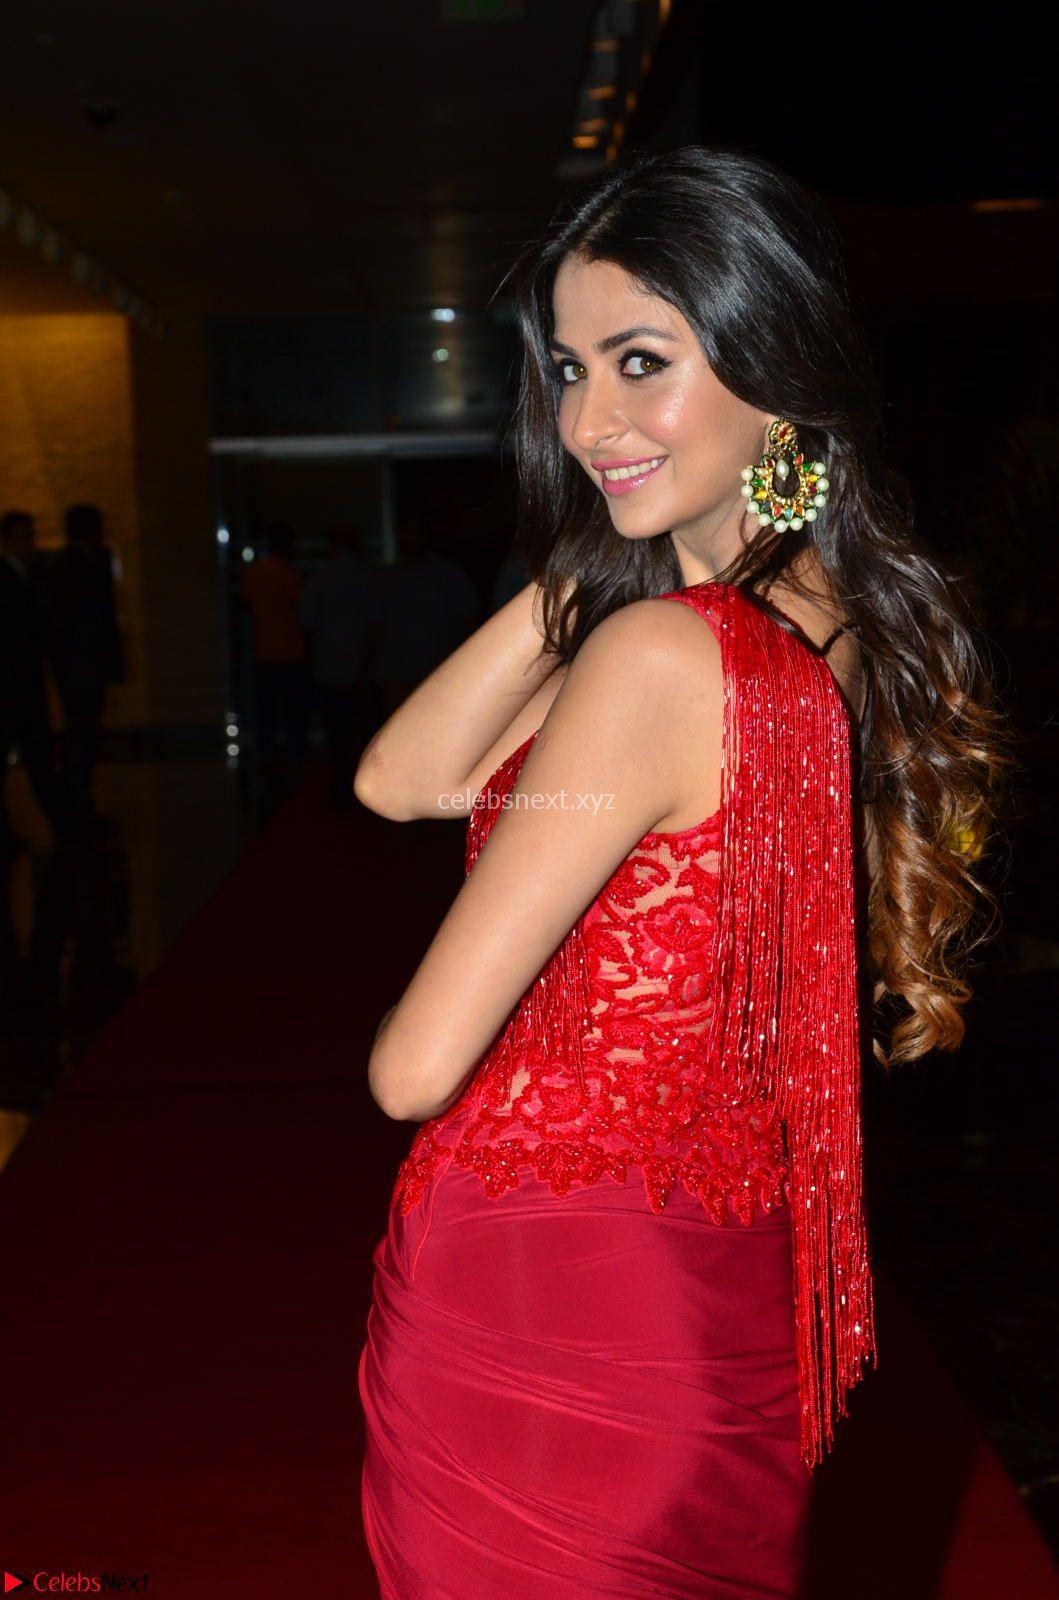 Actress Malvika Raaj in Red Leg Split Gorgeous Gown at Jayadev Audio Function 2017 ~ CelebsNext Exclusive